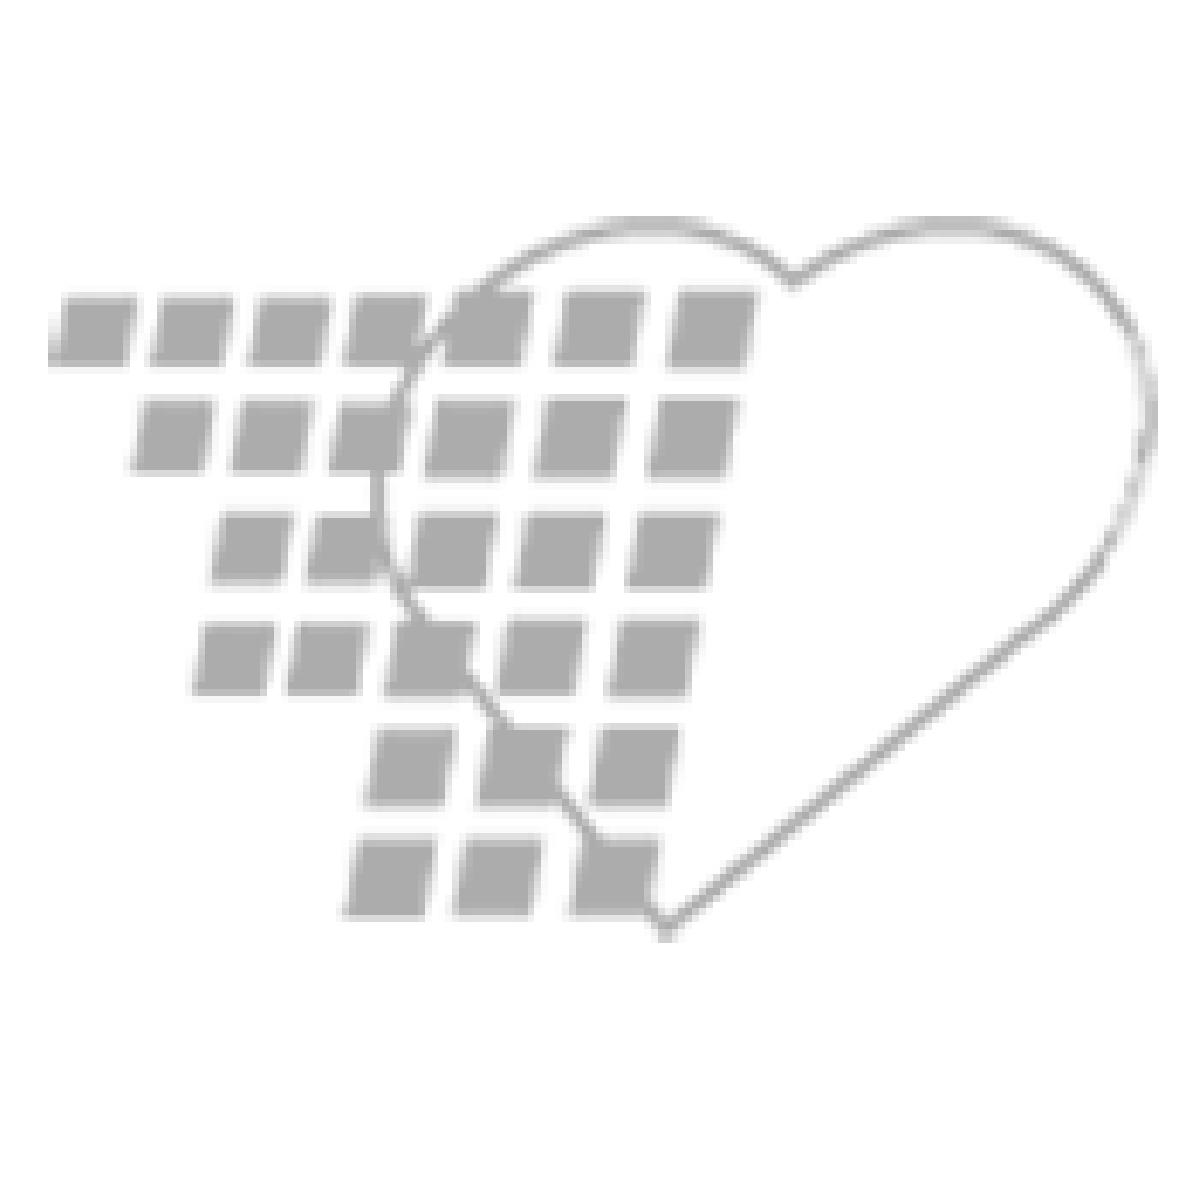 06-82-9071 Monoject™ Oral Syringe - 10 mL